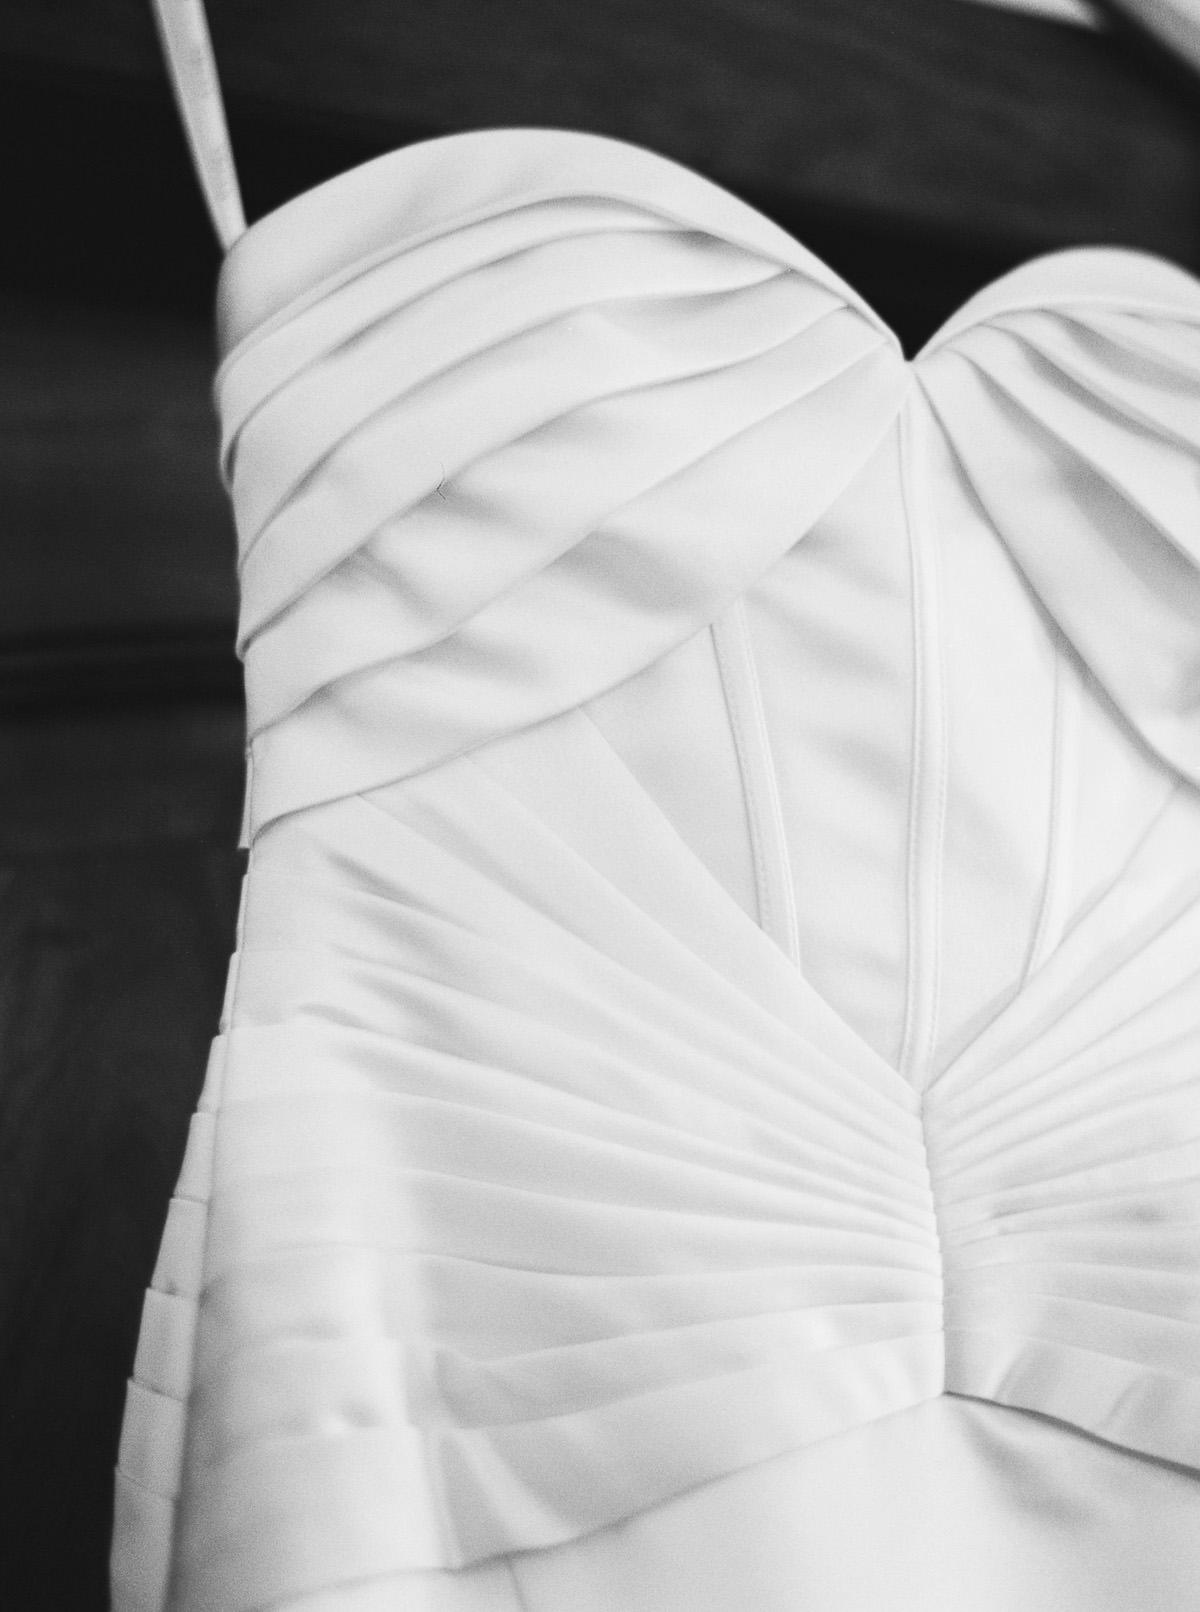 Zac Posen wedding gown captured by top Spokane Wedding Photographer Anna Peters